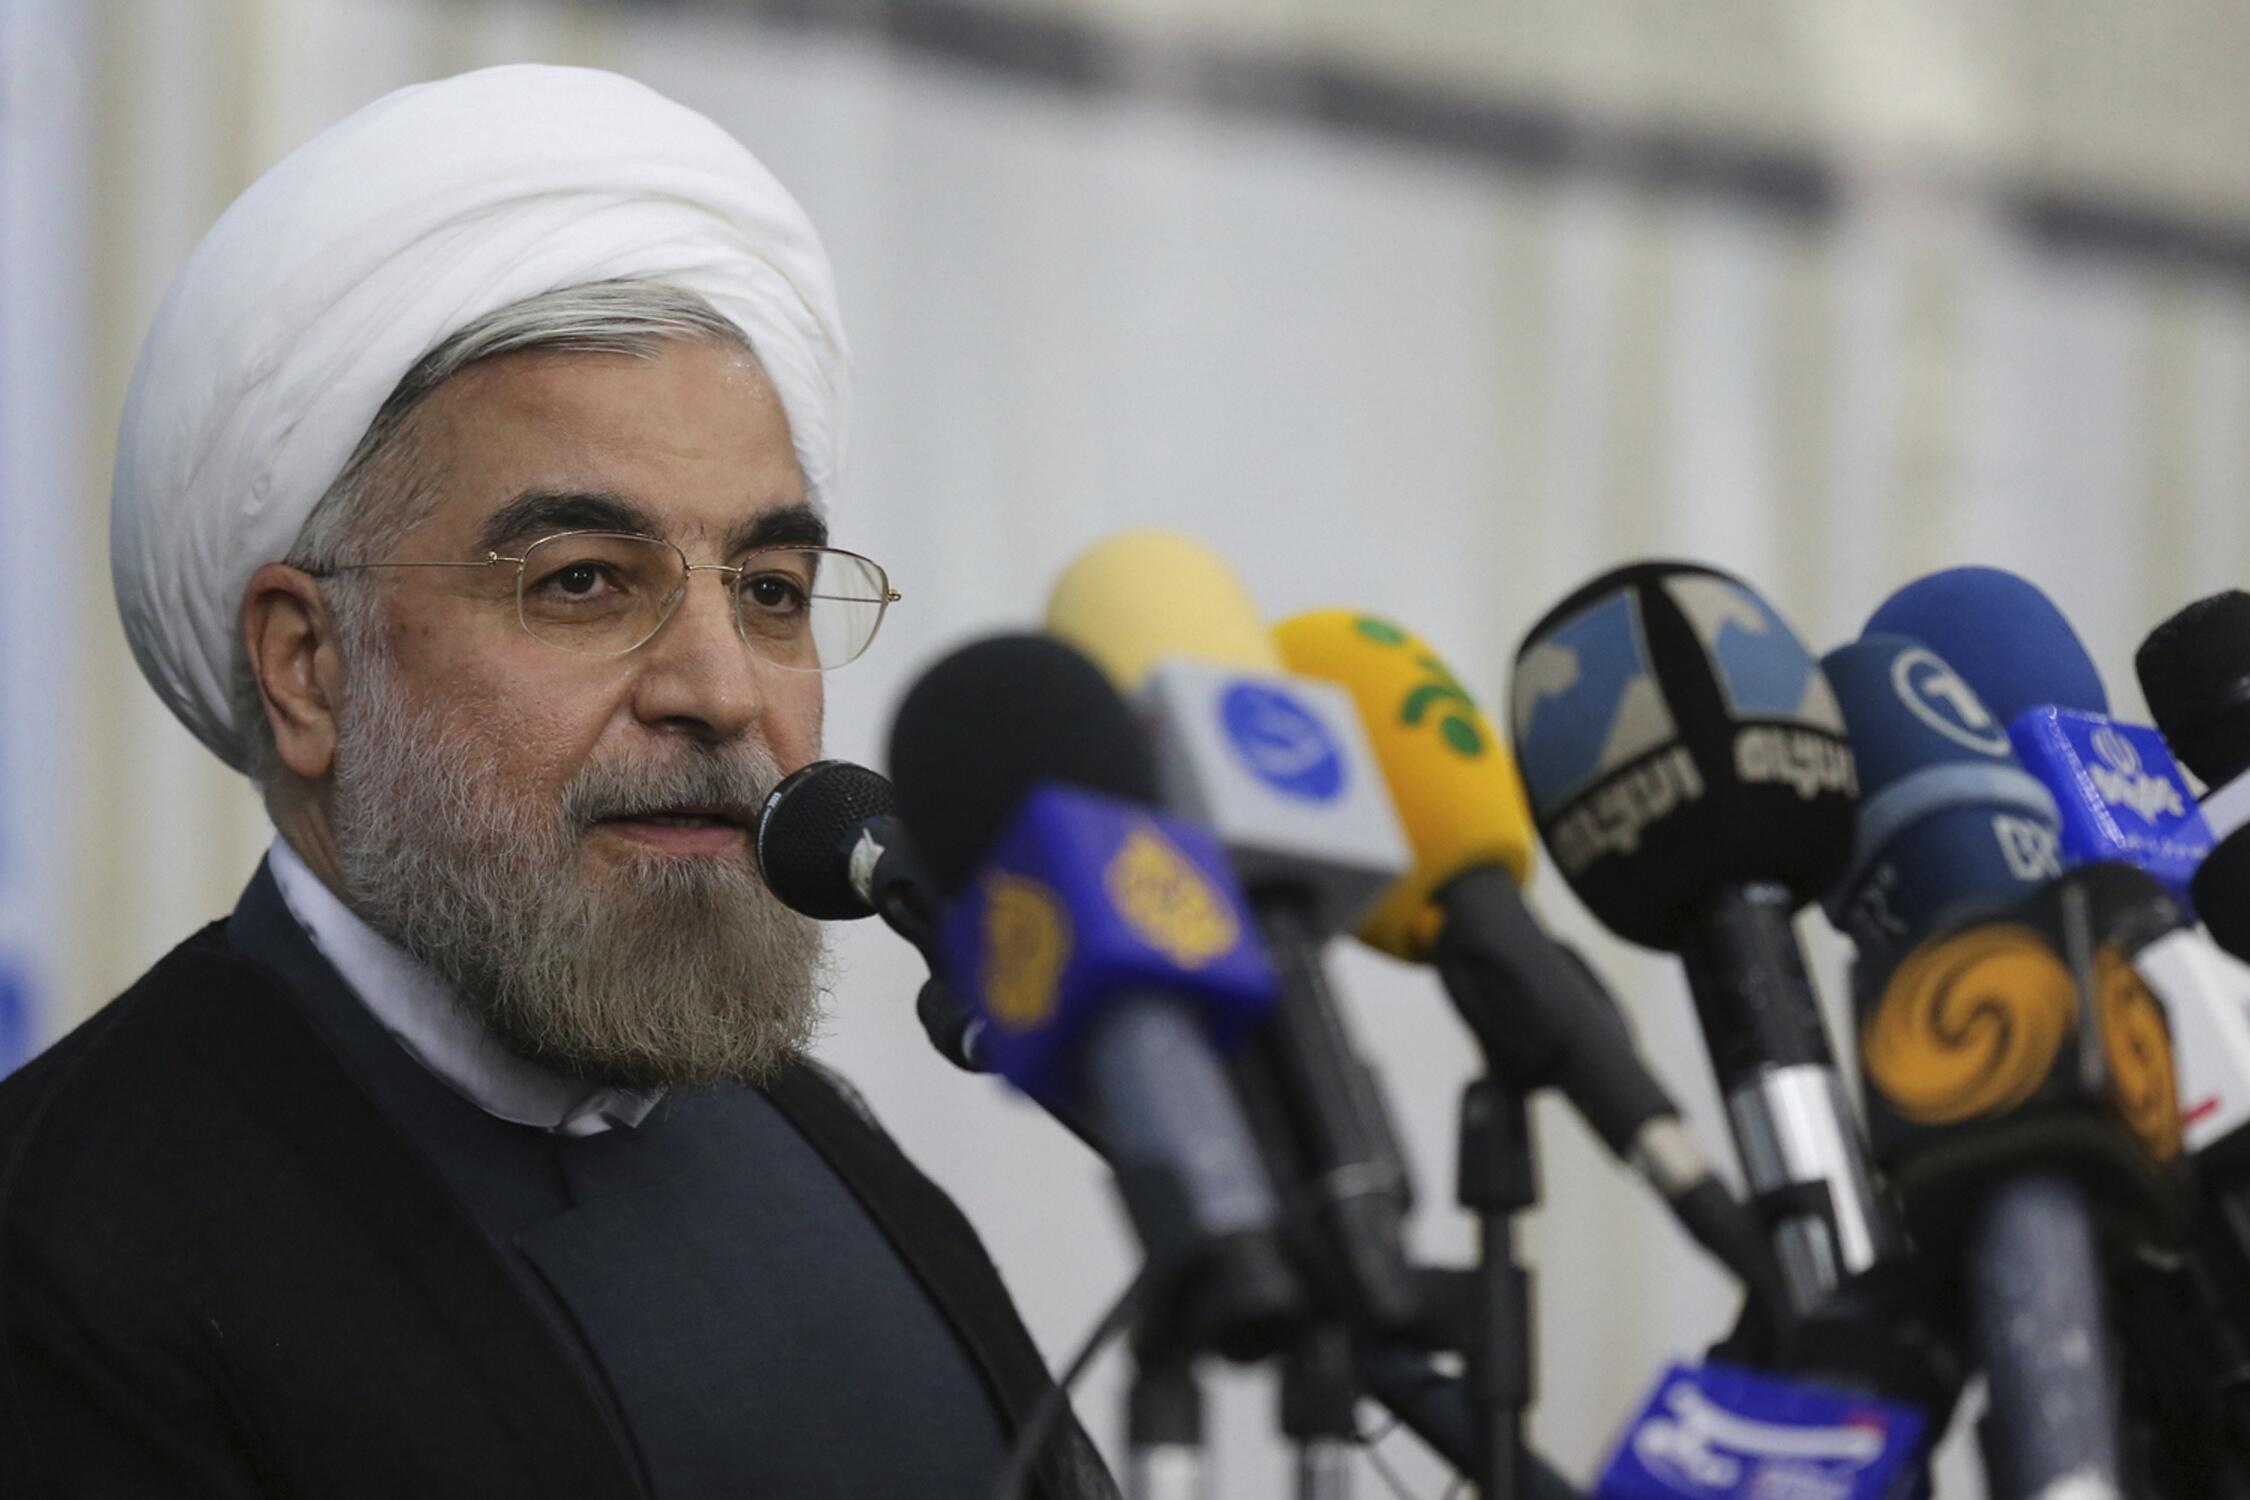 Хасан Рухани в Тегеране, 16.06.2013